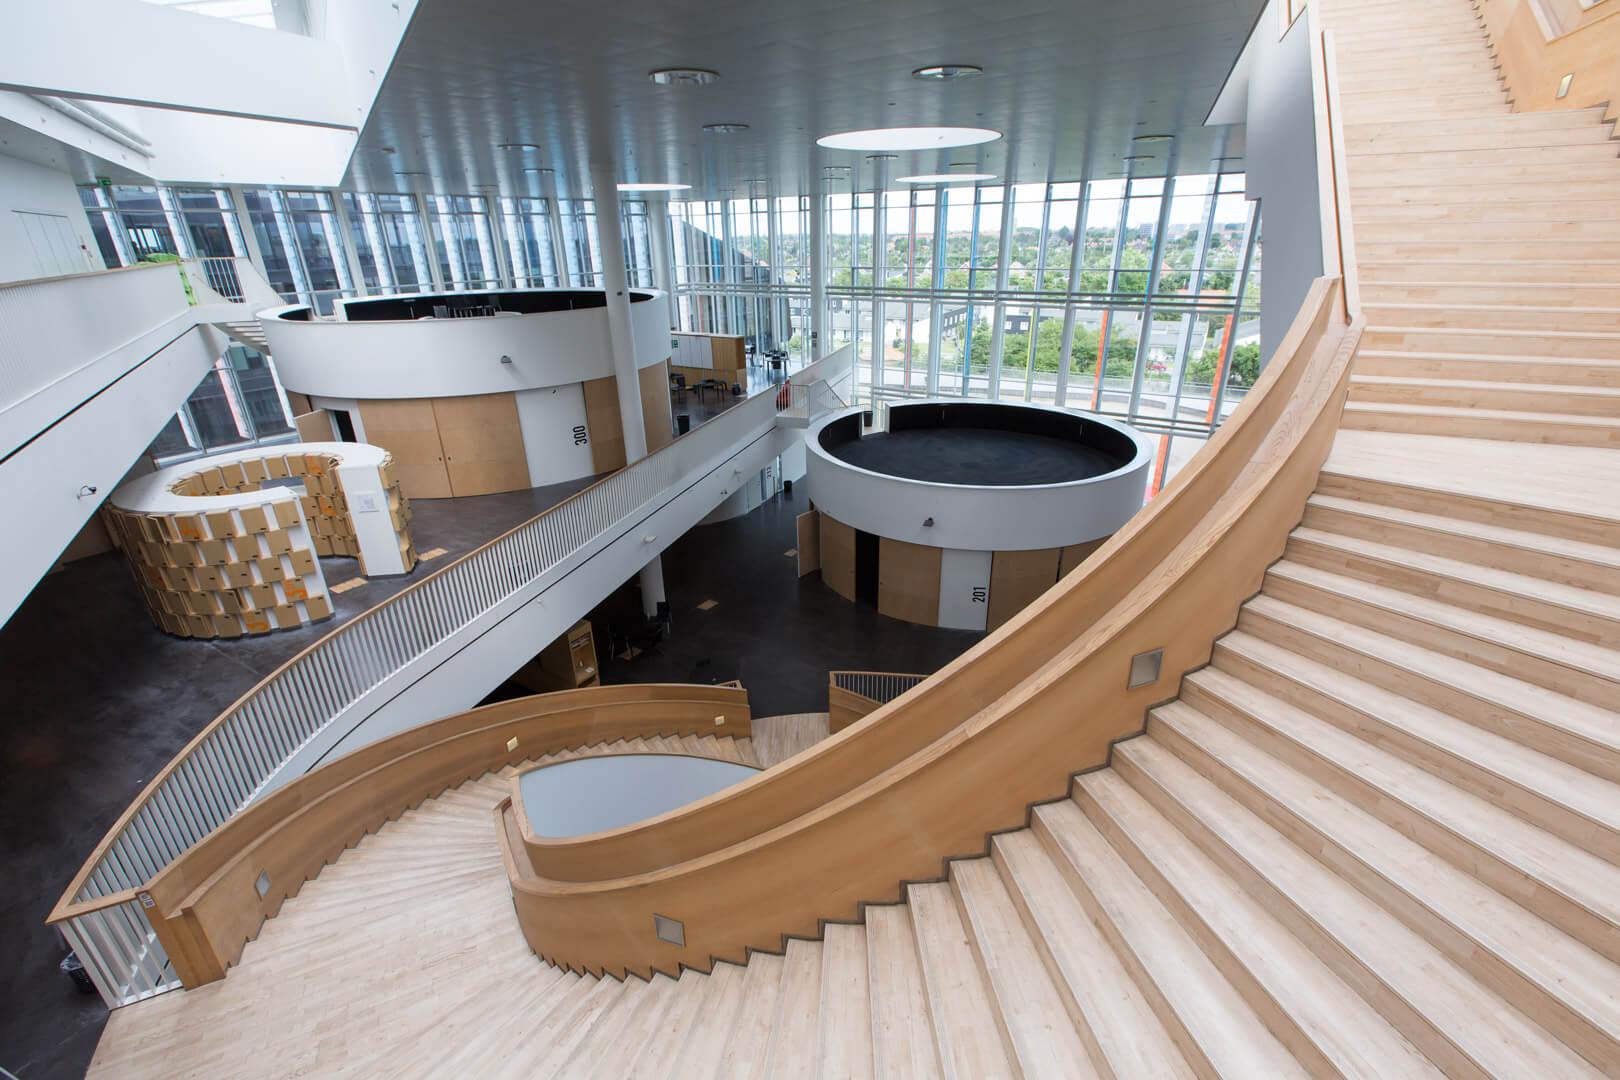 Gymnasium Orestad, Kopenhagen, Dumont